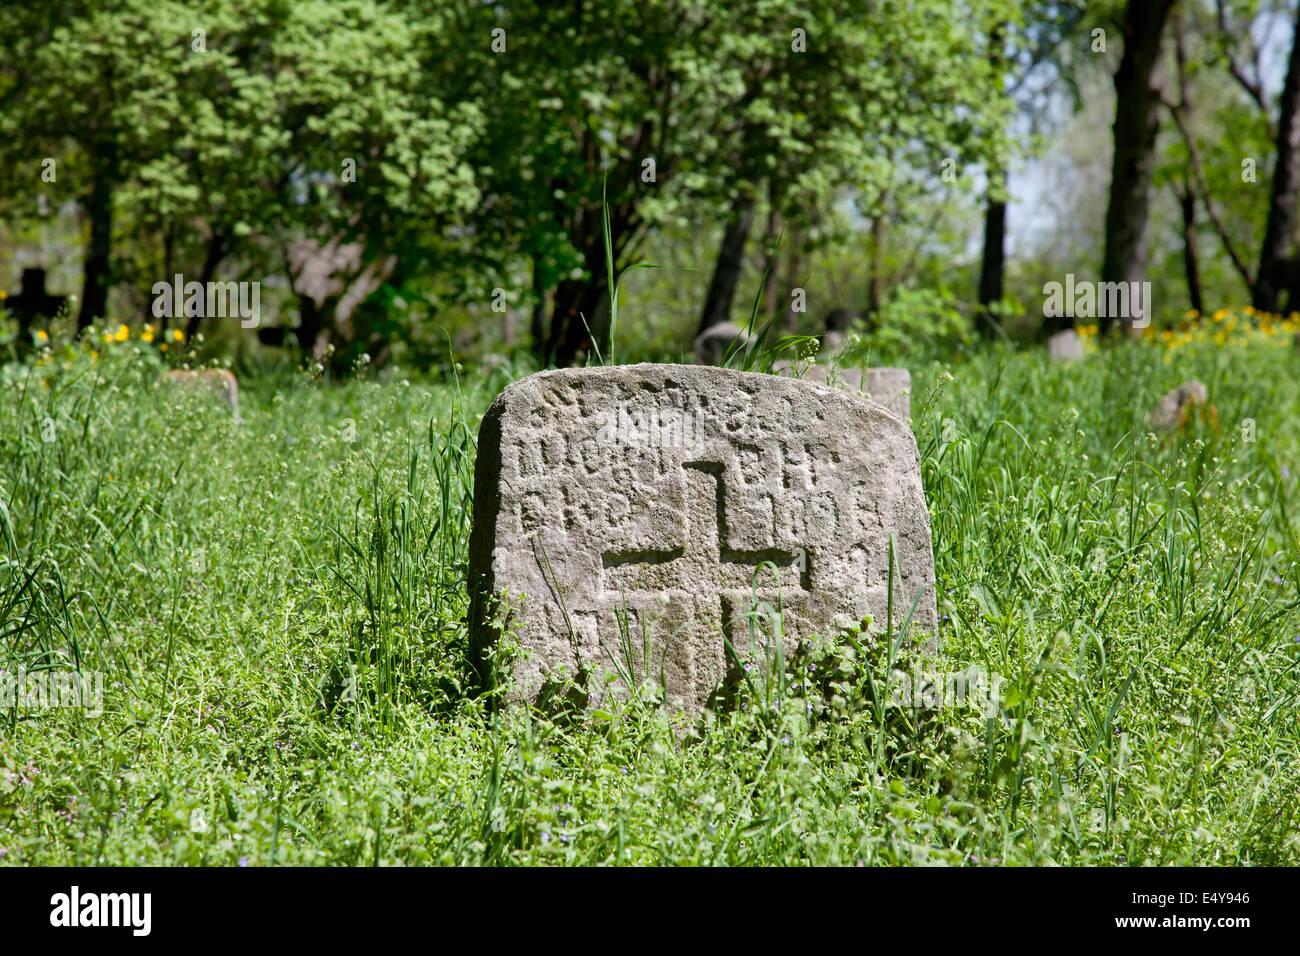 Pagan prehistorical grave - Stock Image